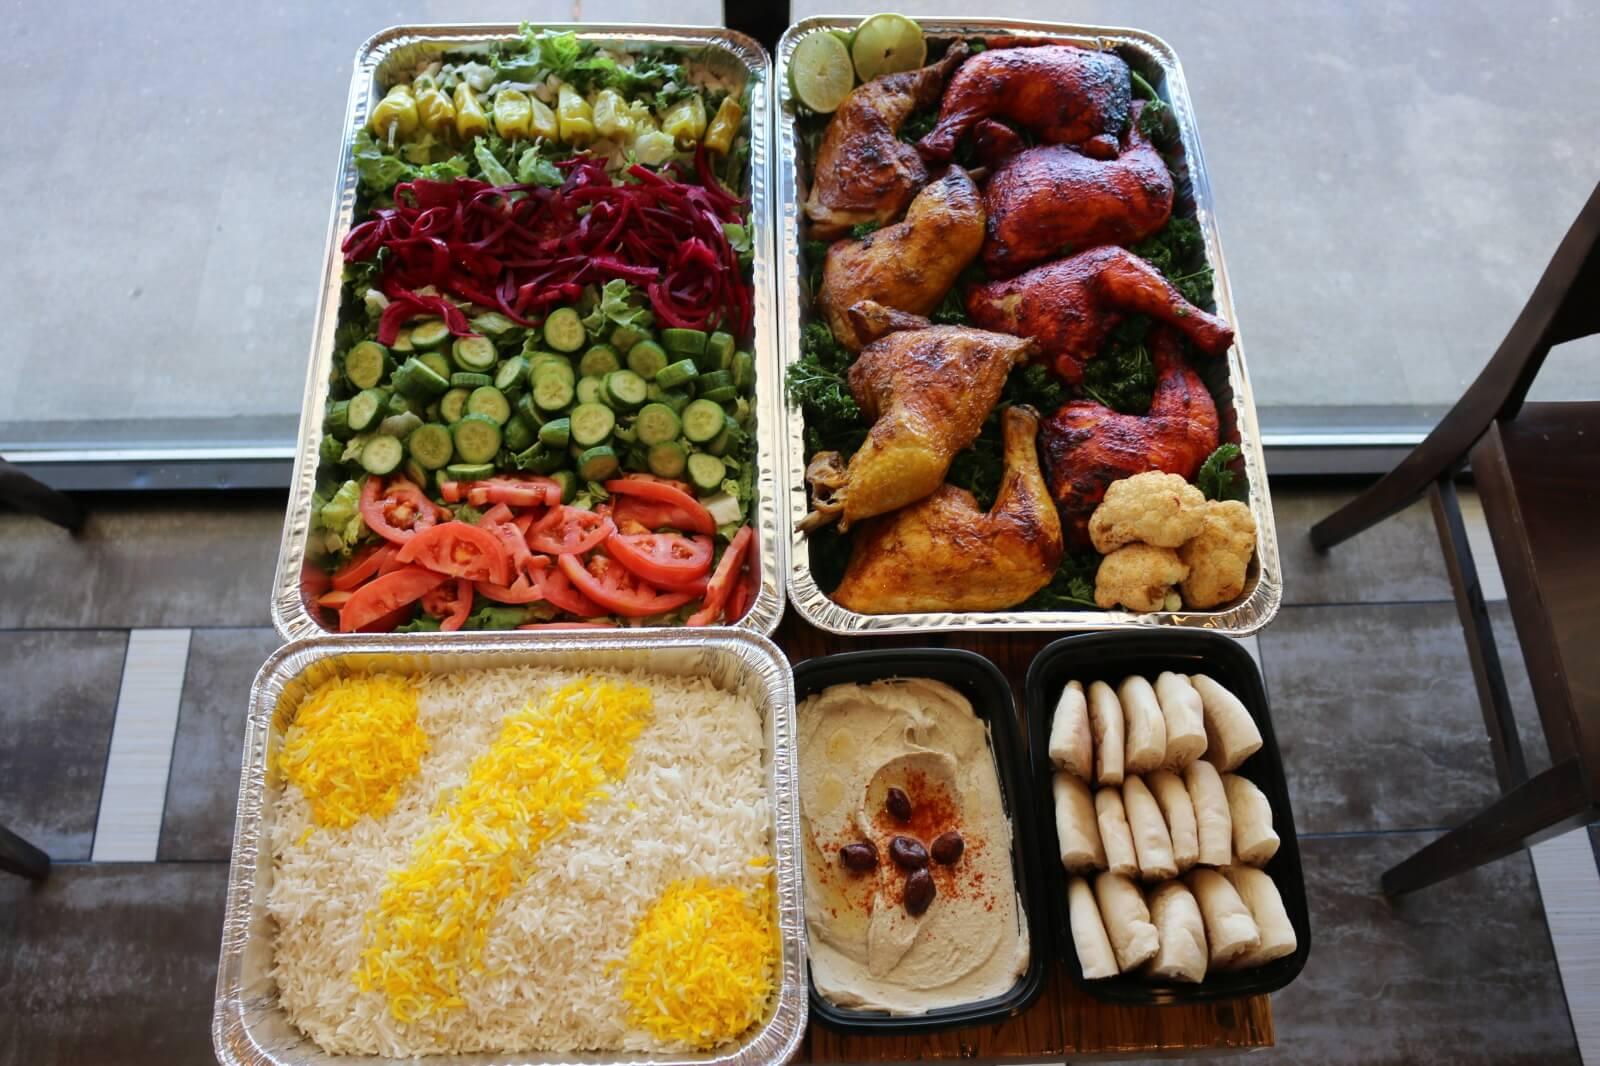 Chickpeas chicken tandoori salad and hummus package